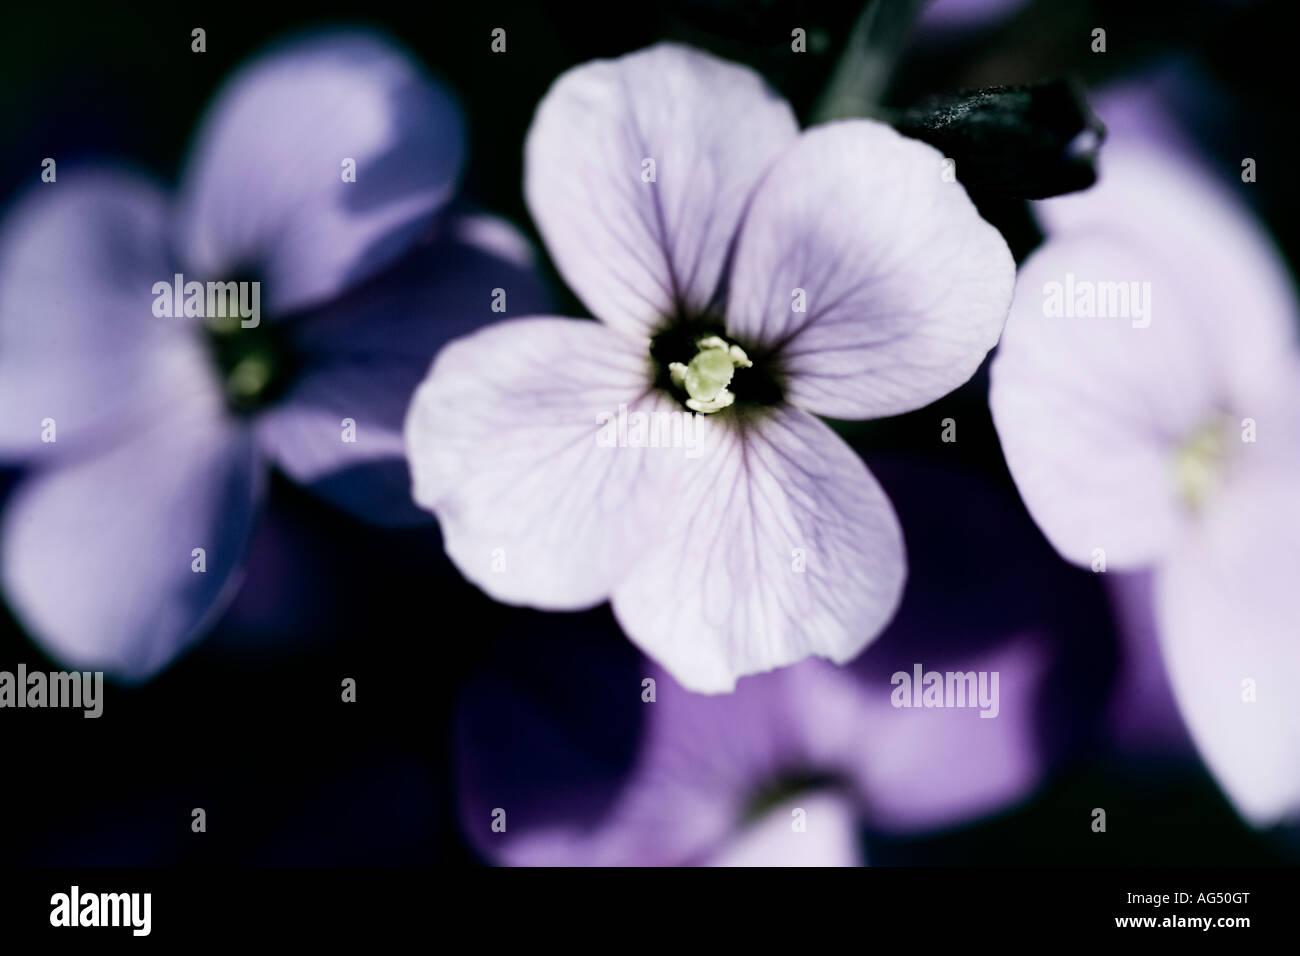 Close up shot of mauve Wallflowers against a black backdrop - Stock Image